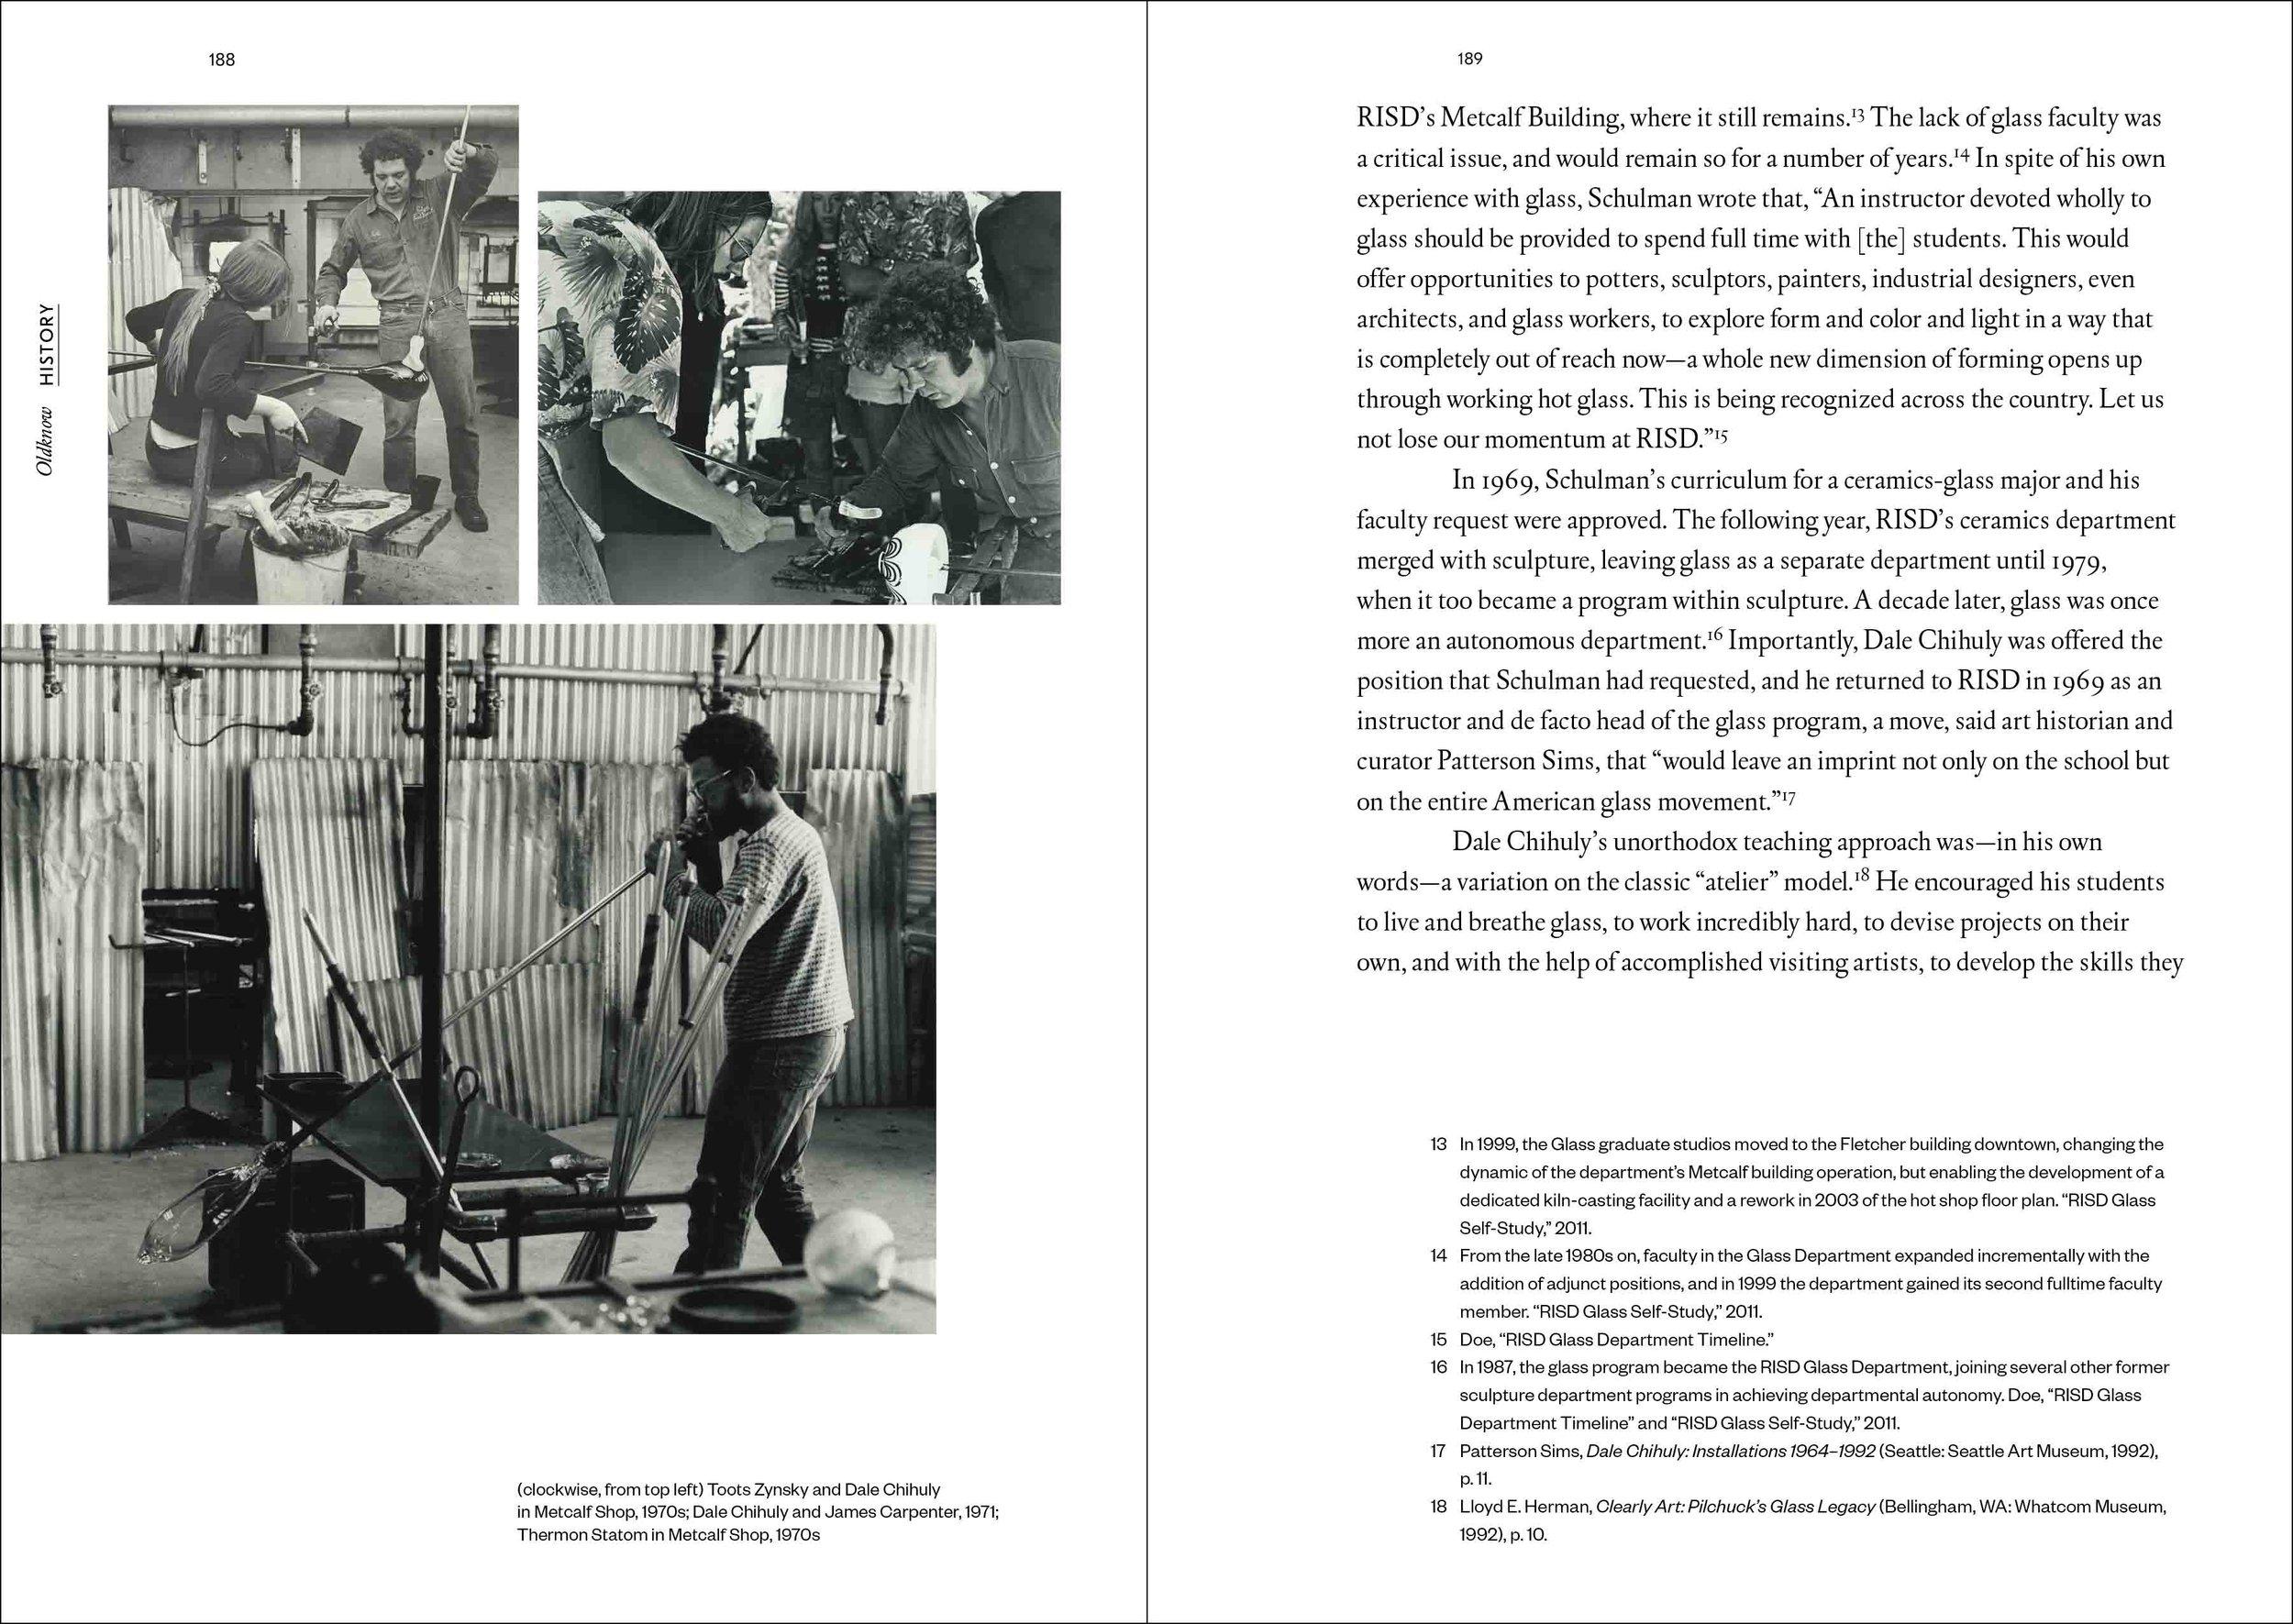 RISDglass50.PRspreads.188-189 2.jpg